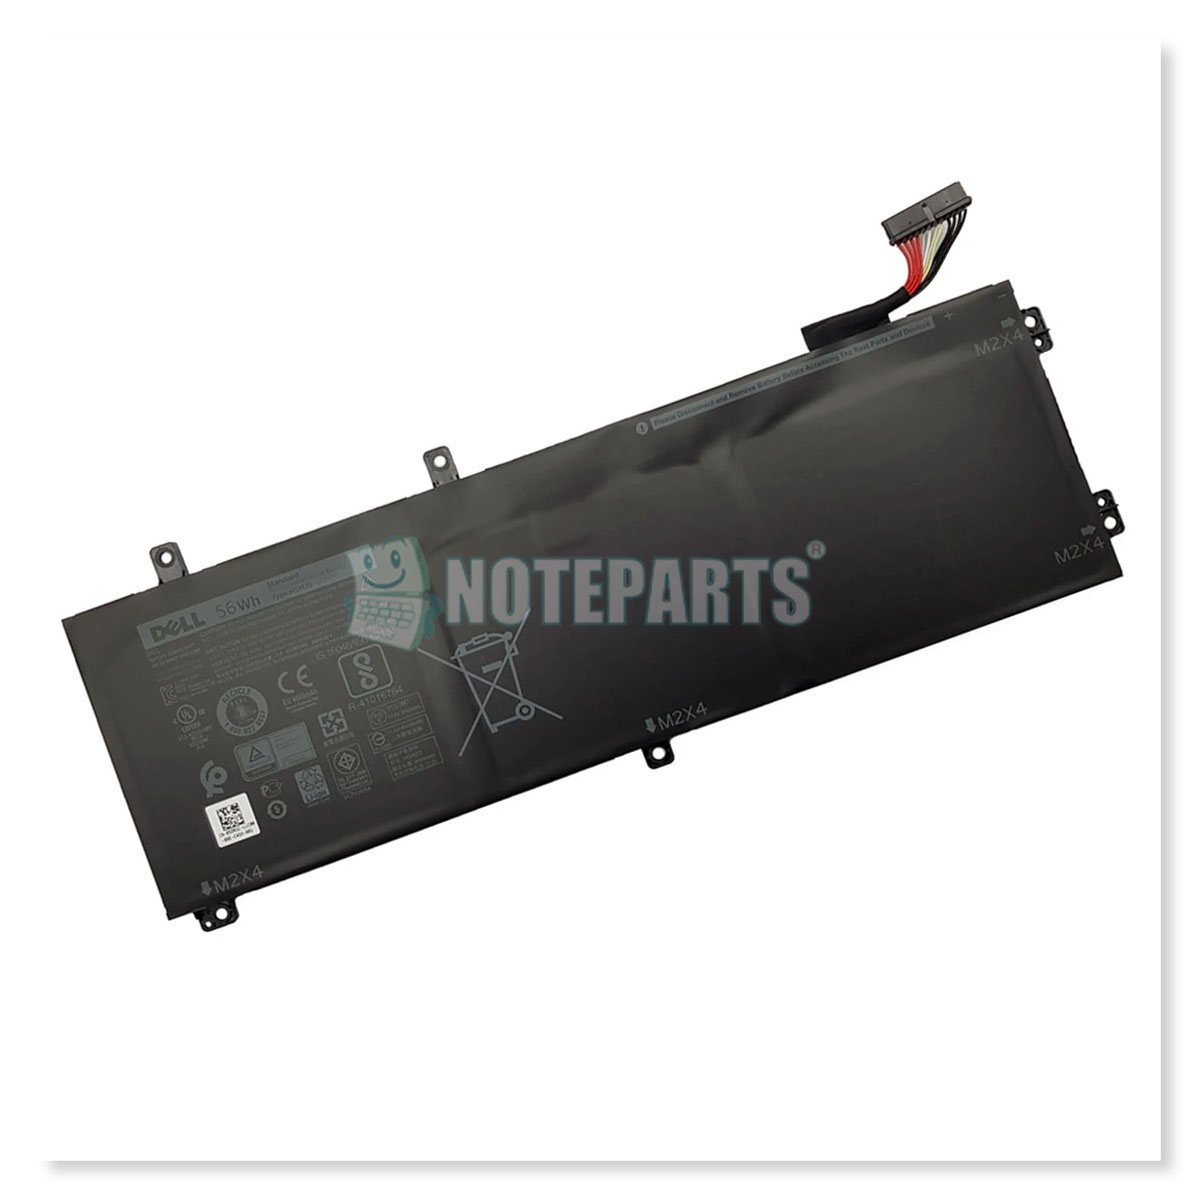 Dell純正 デル XPS 15 (9550/9560/9570)  Precision 15 (5510/5520/5530) 3セル バッテリー H5H20 62MJV